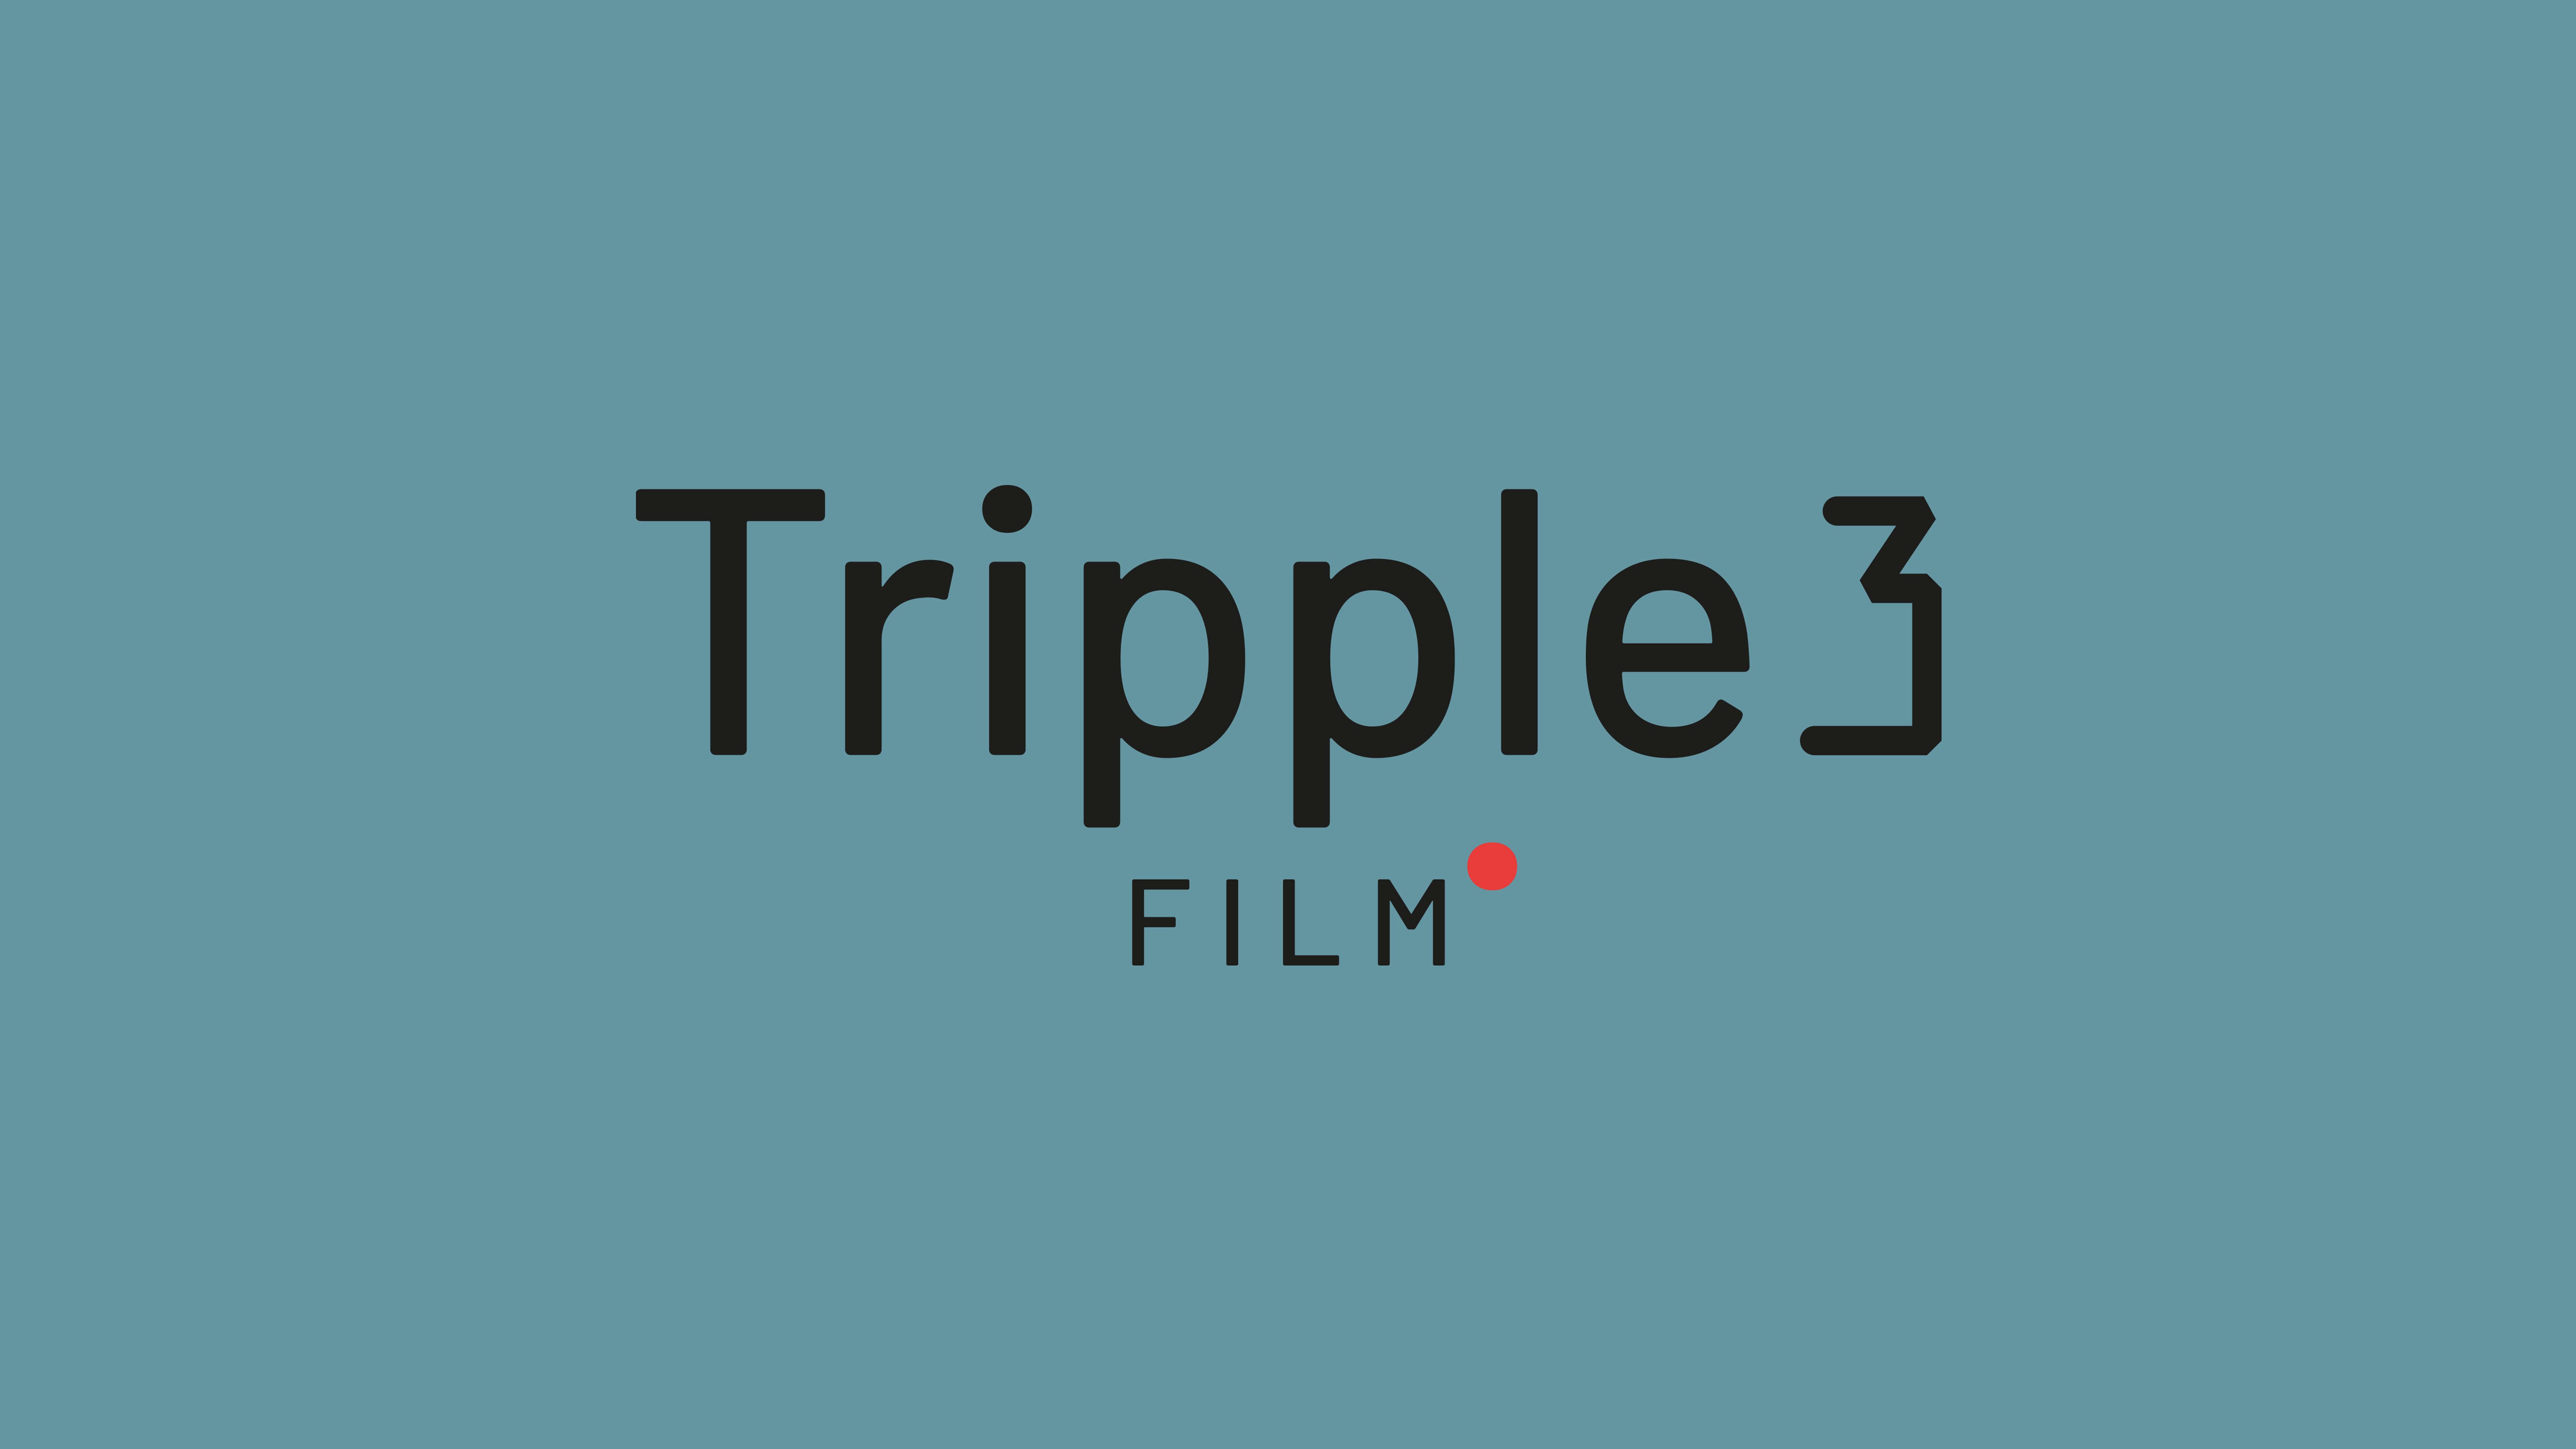 Tripple 3, logo, Mixus studio